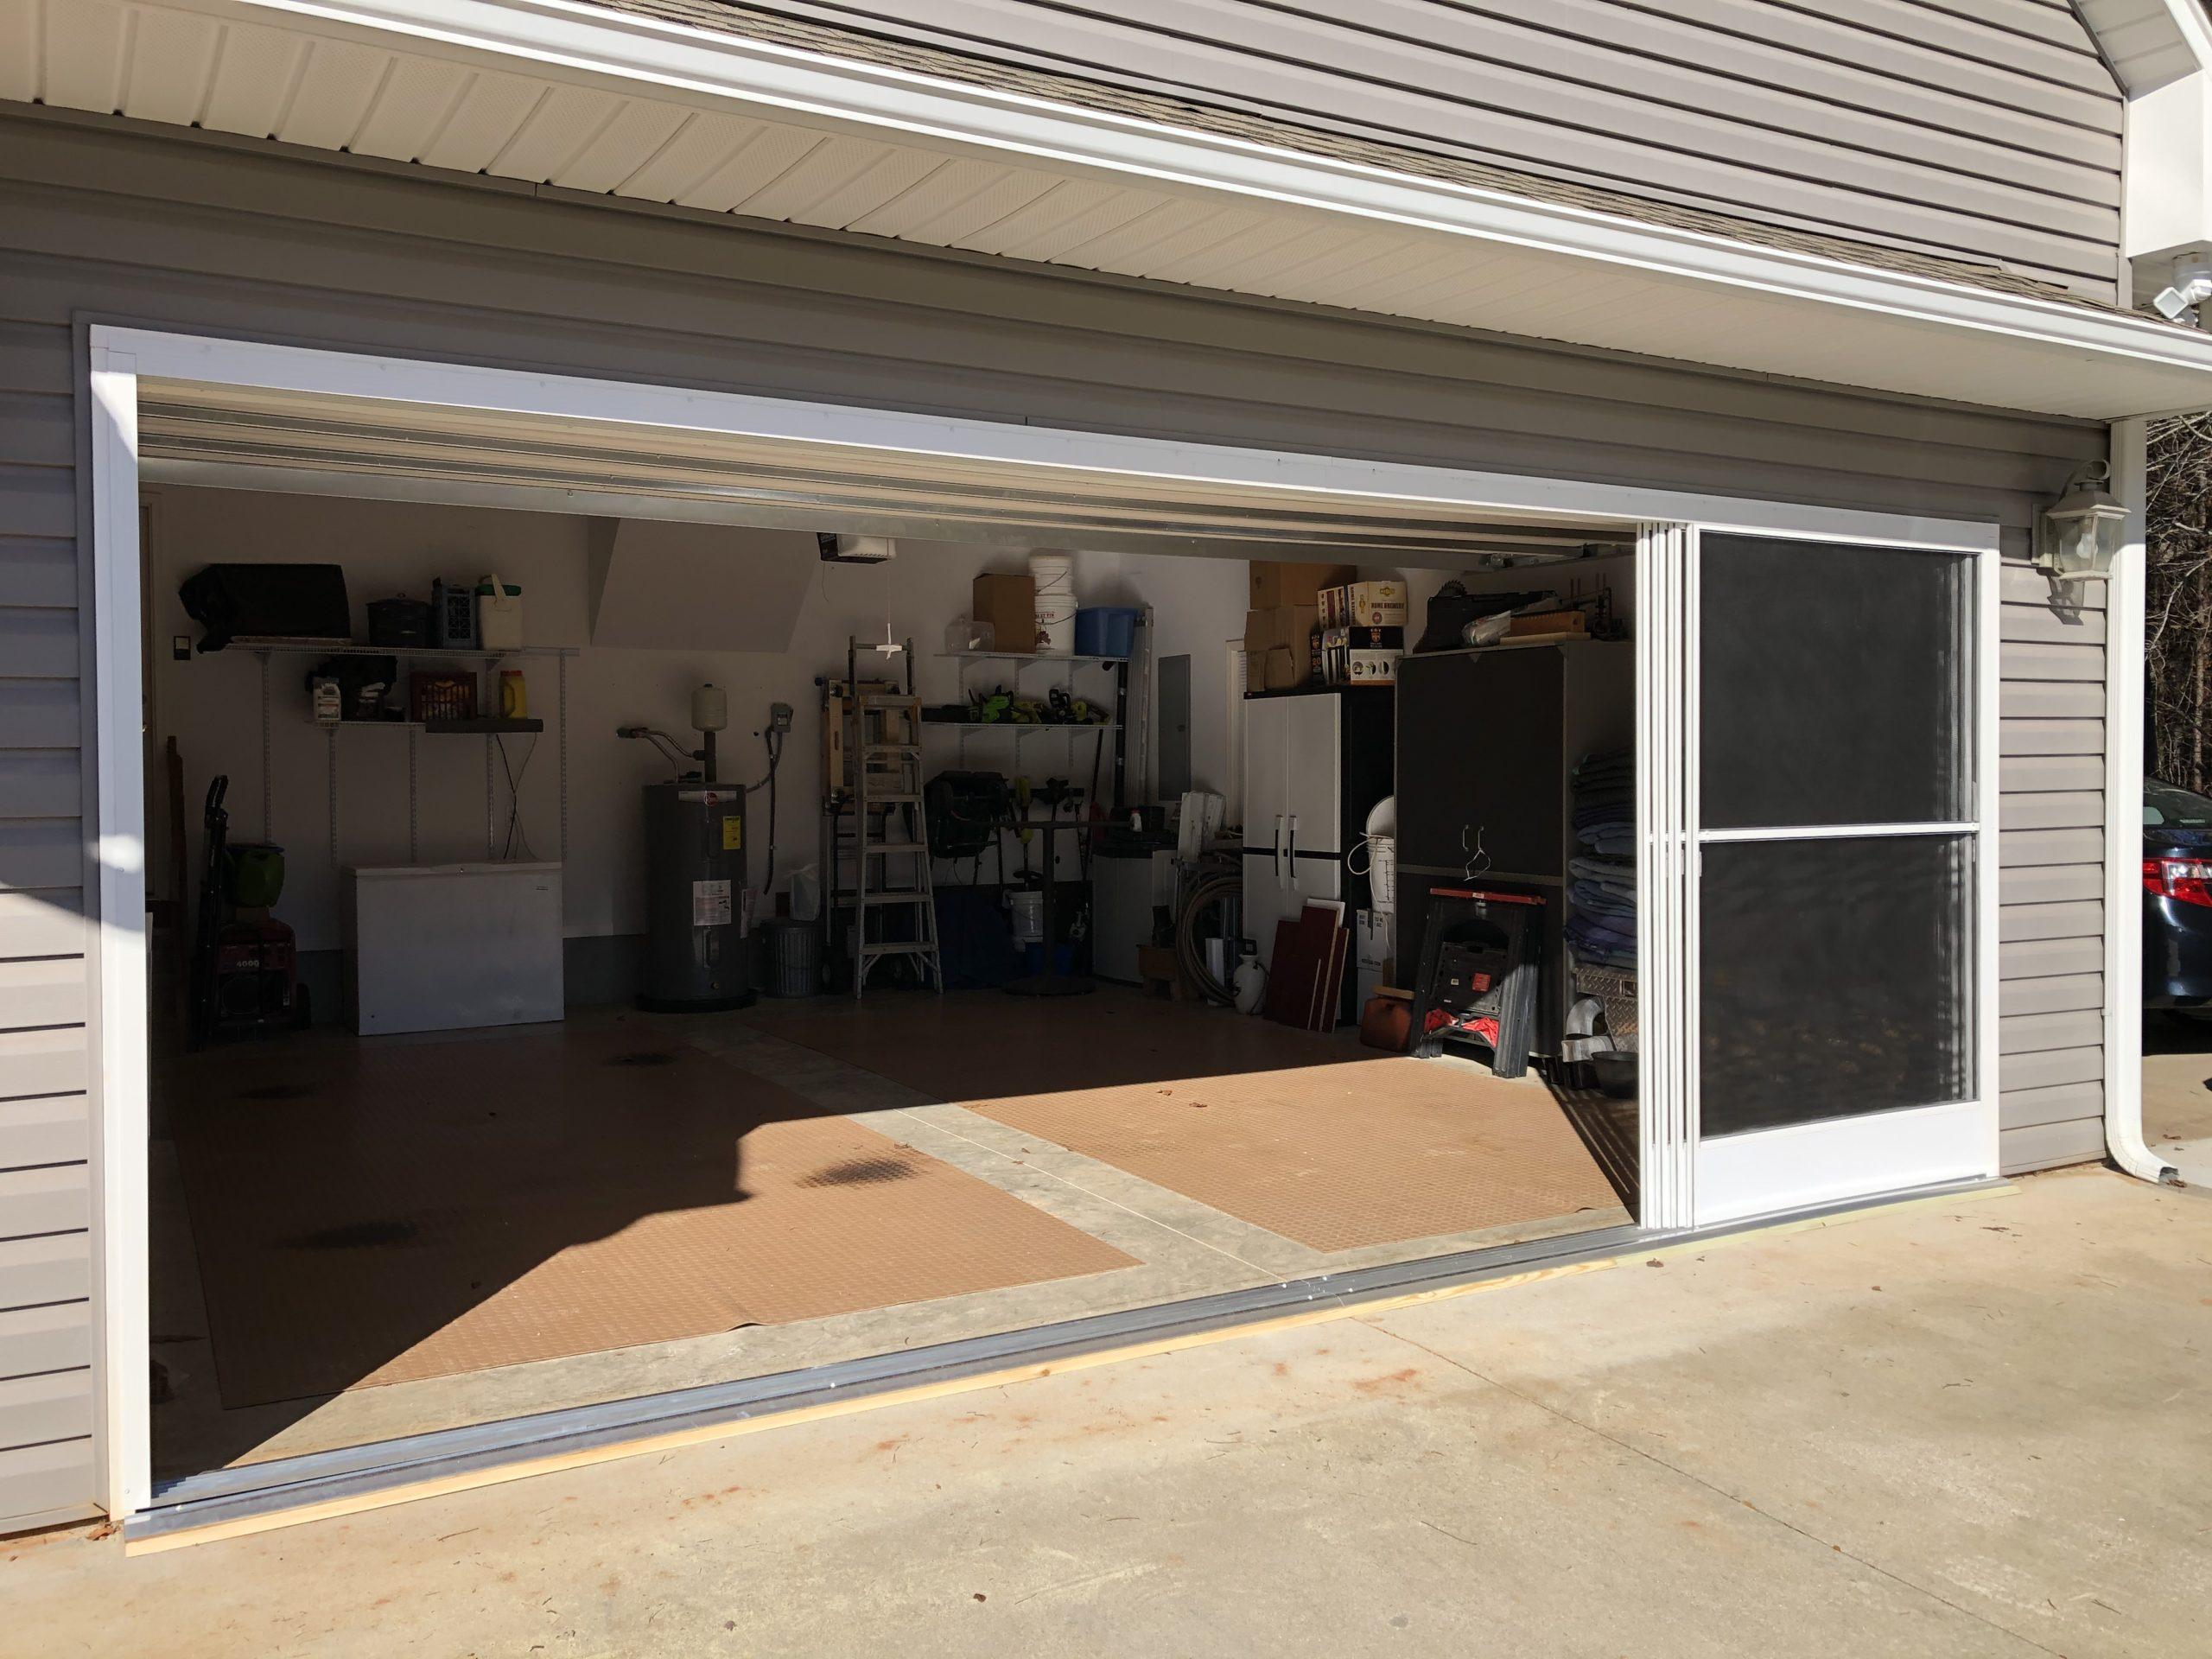 Garage Enclosure Travelers Rest, greer